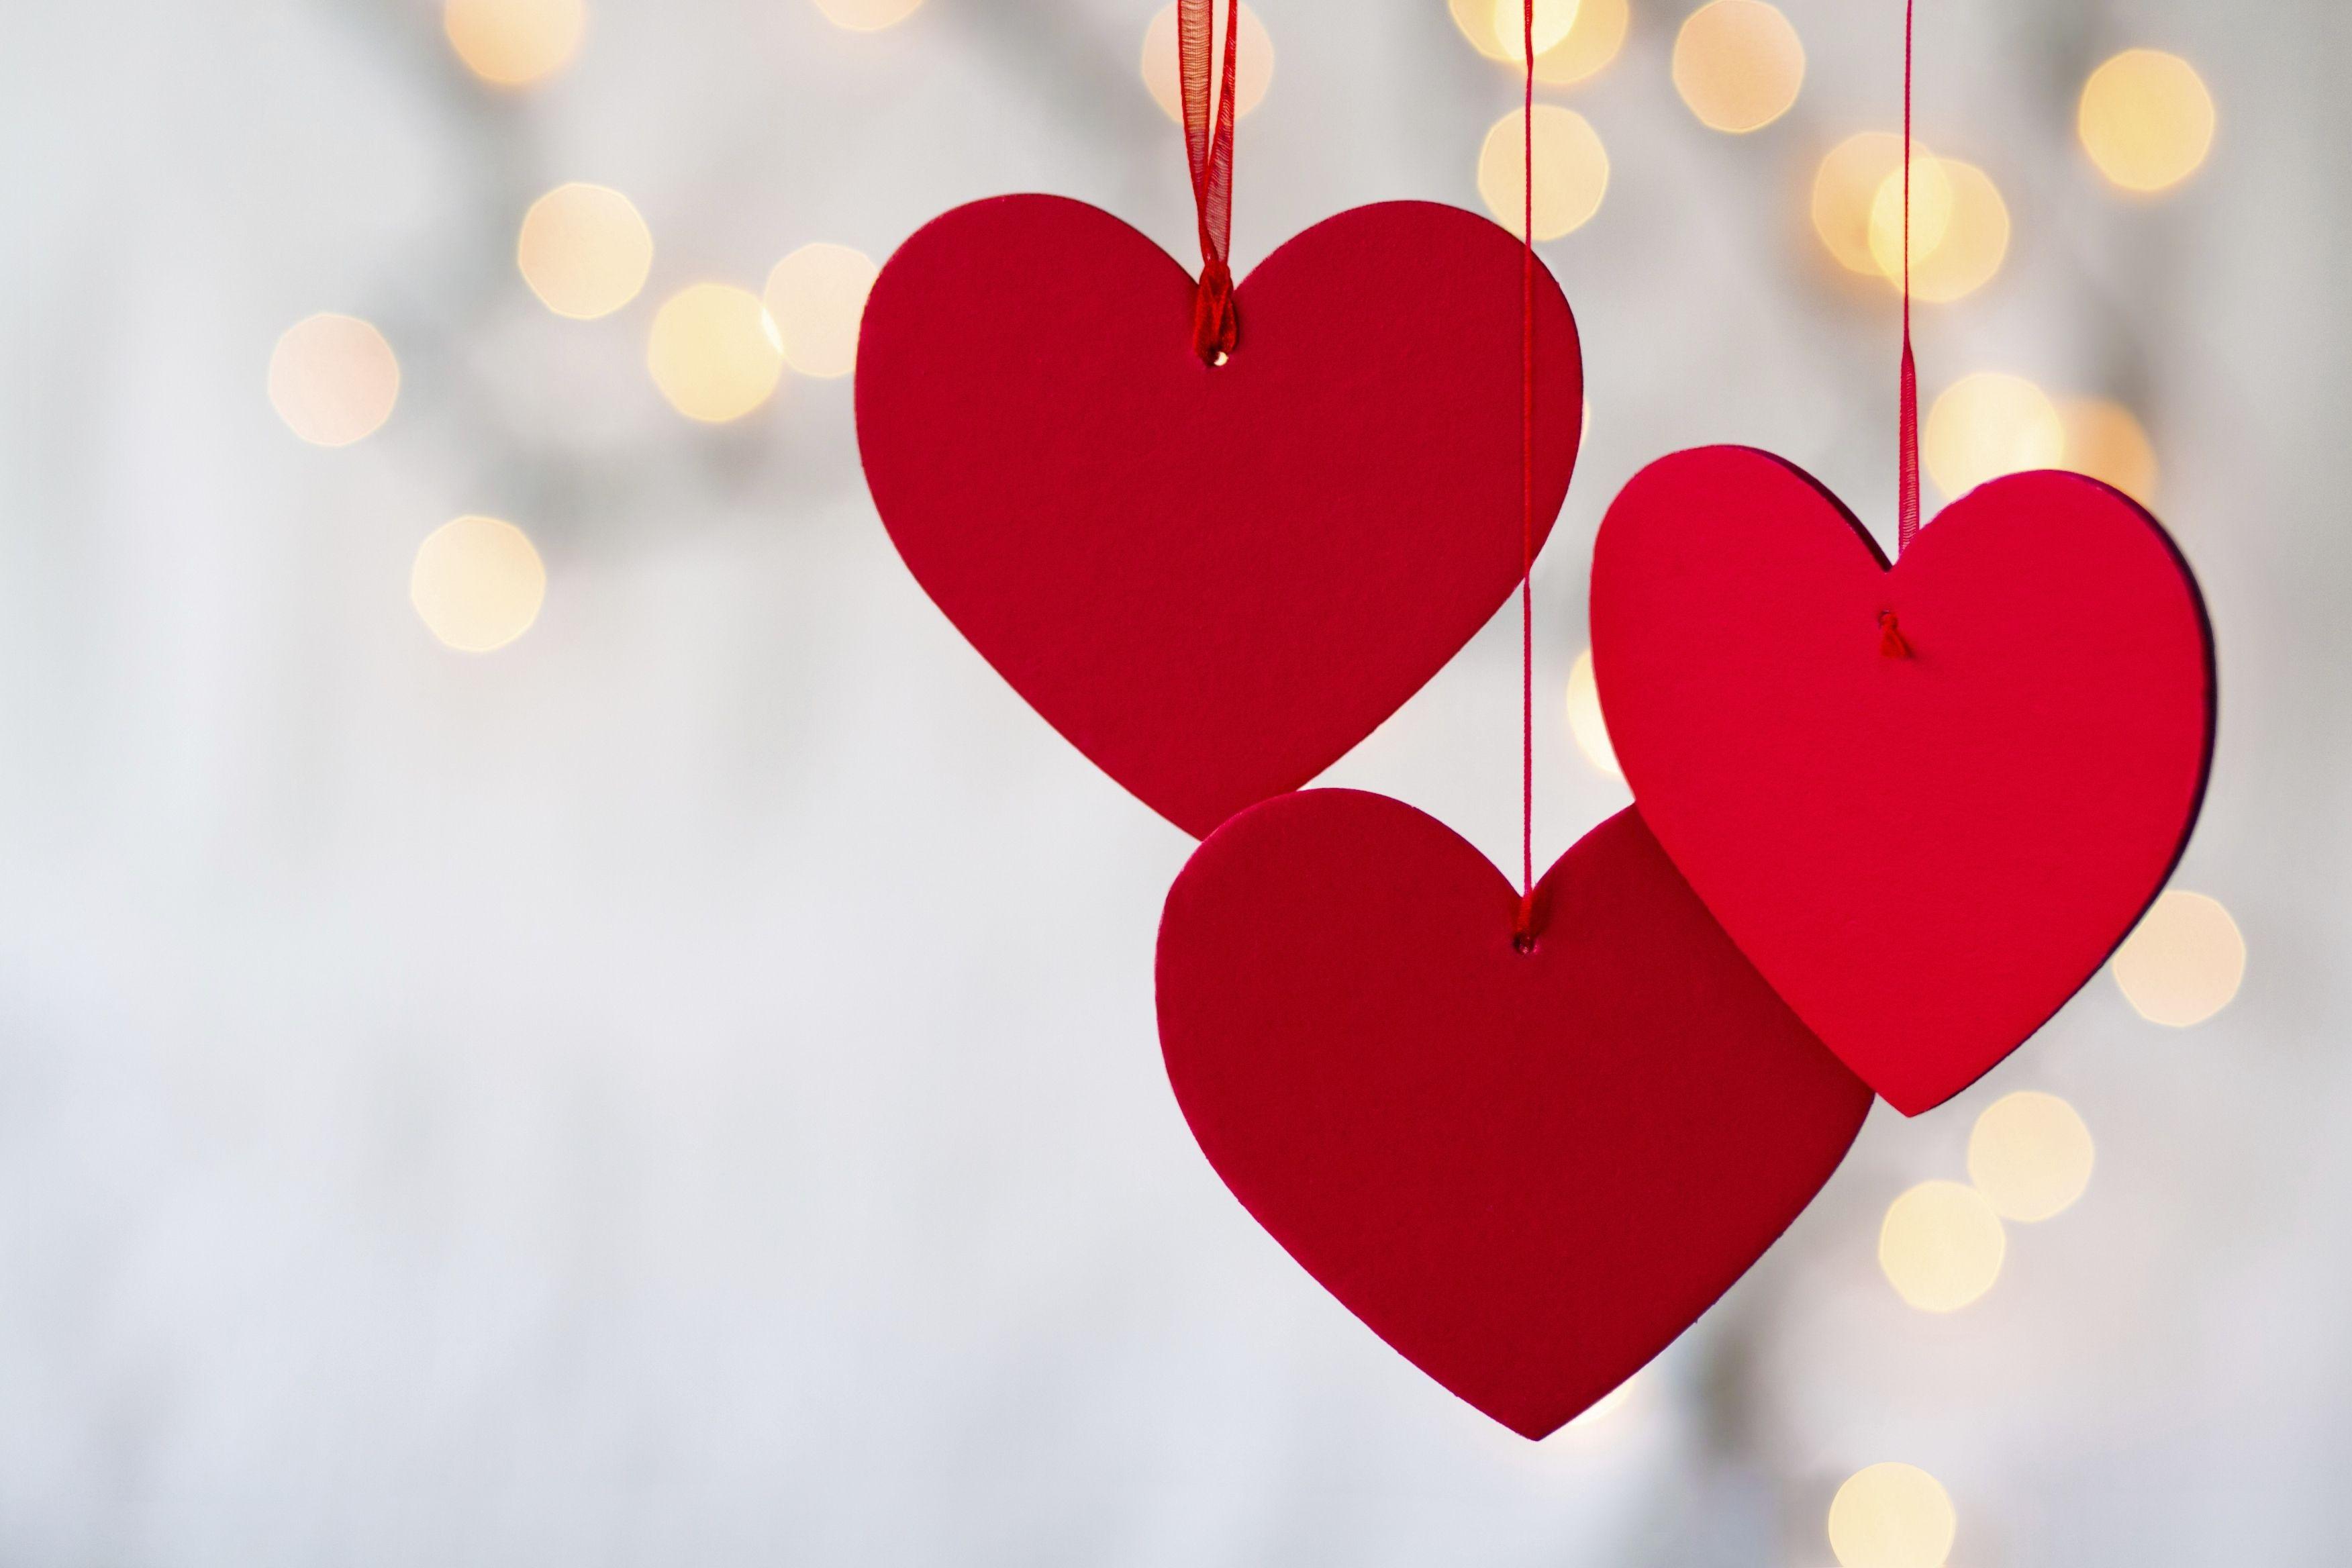 Valentines Day Desktop Wallpapers   Top Valentines Day 3504x2336